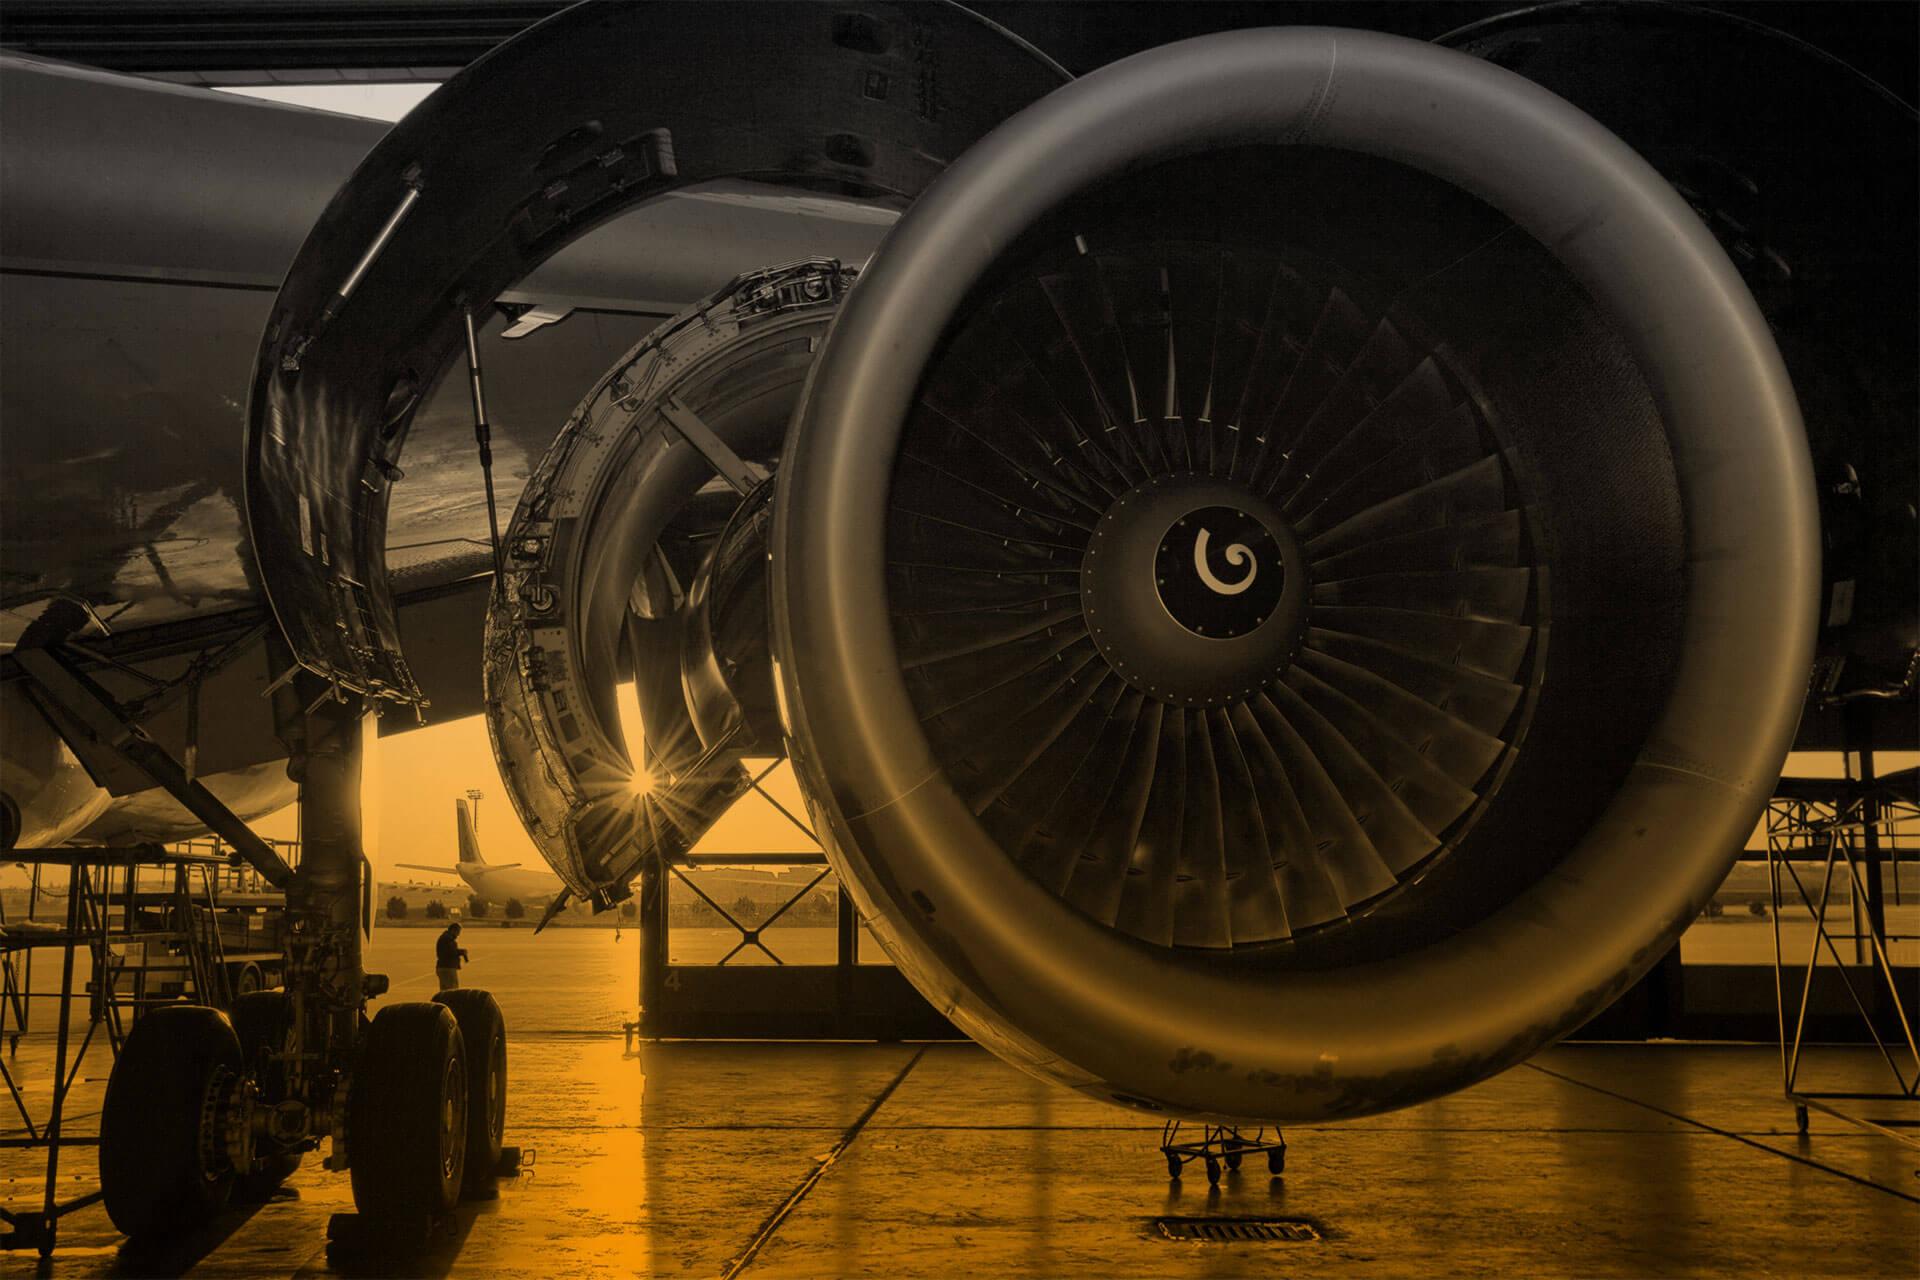 aea manutentore tecnico aeronautico